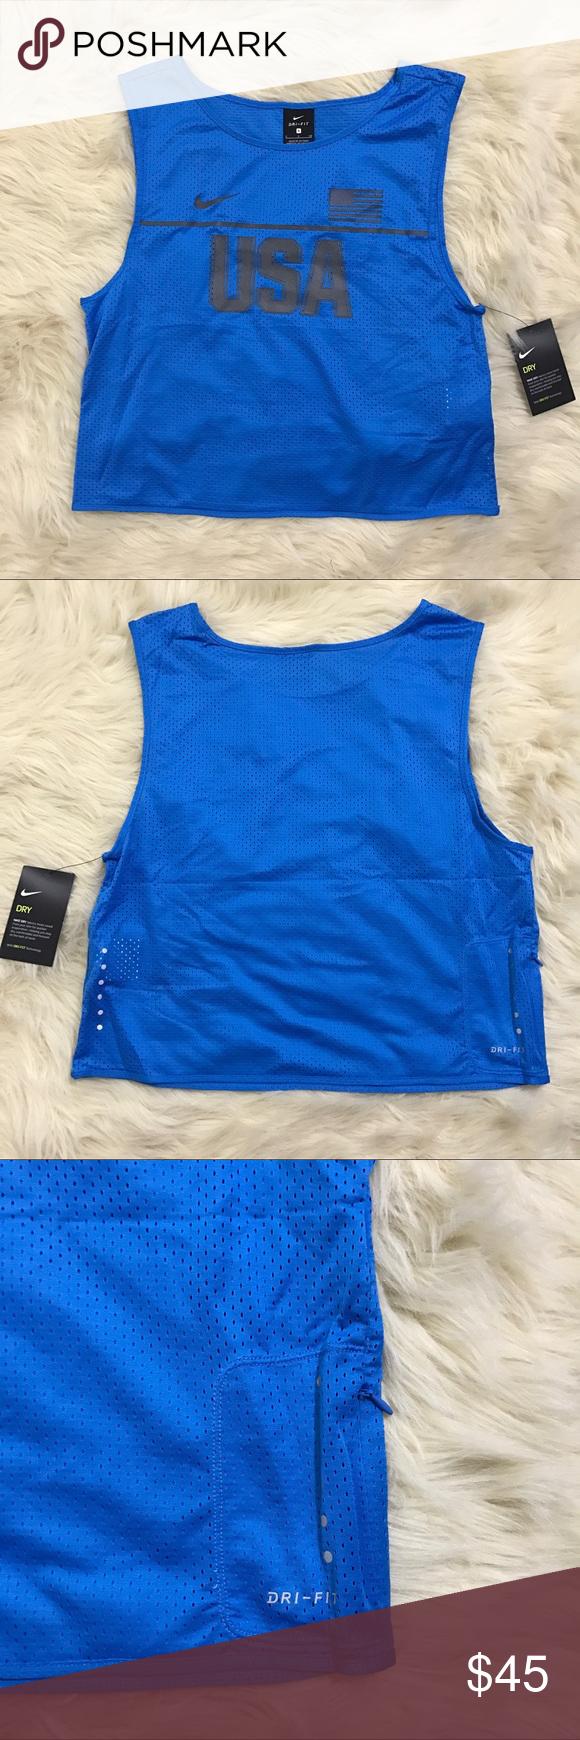 ⚡️Nike USA dri-fit top Nike running USA dri-fit mesh ...